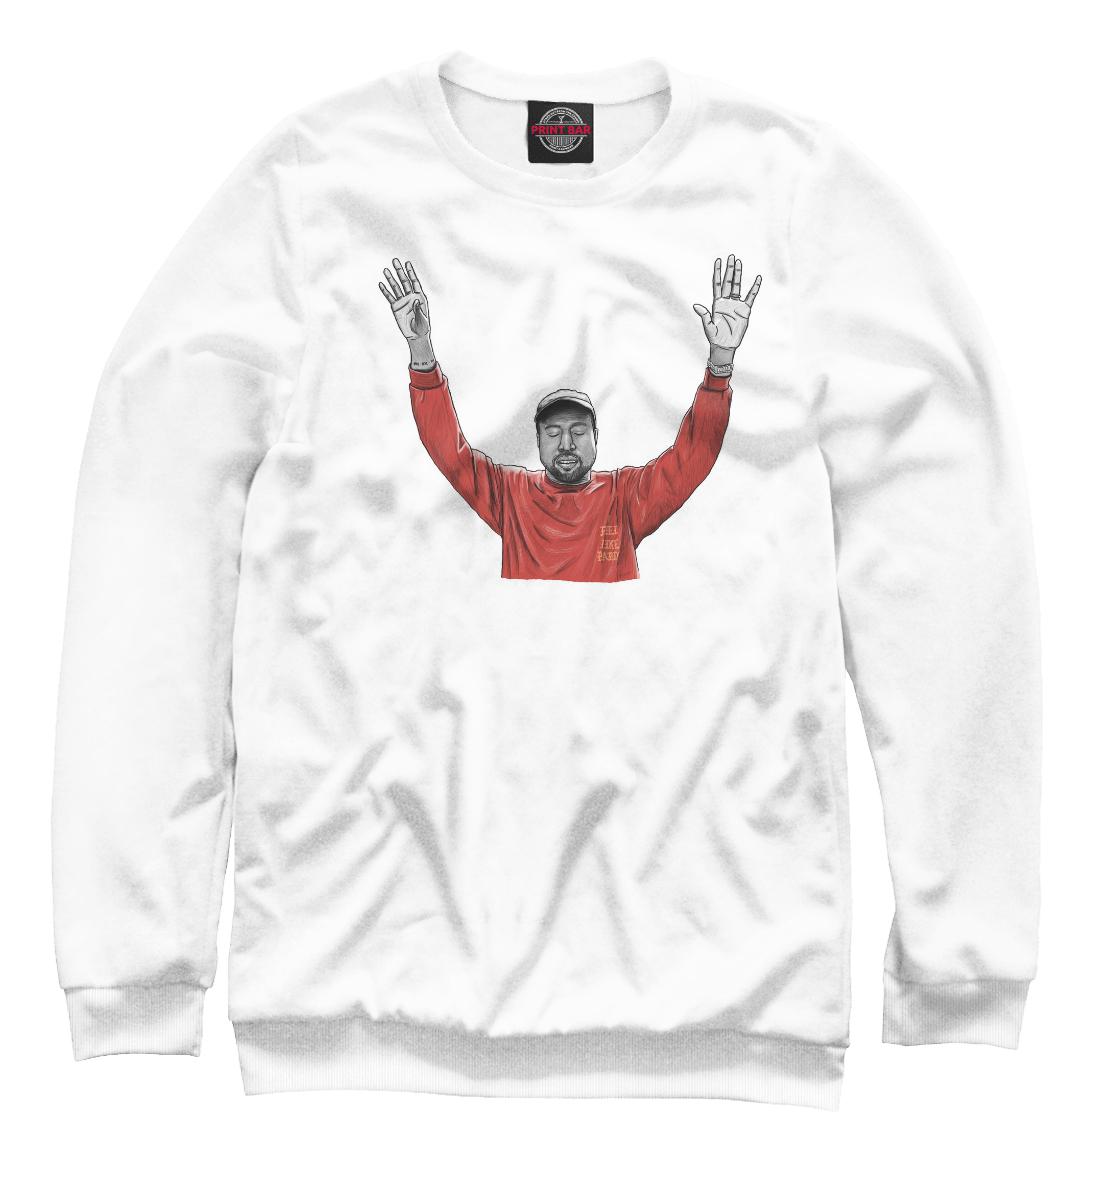 Купить Kanye West, Printbar, Свитшоты, KAW-965879-swi-2